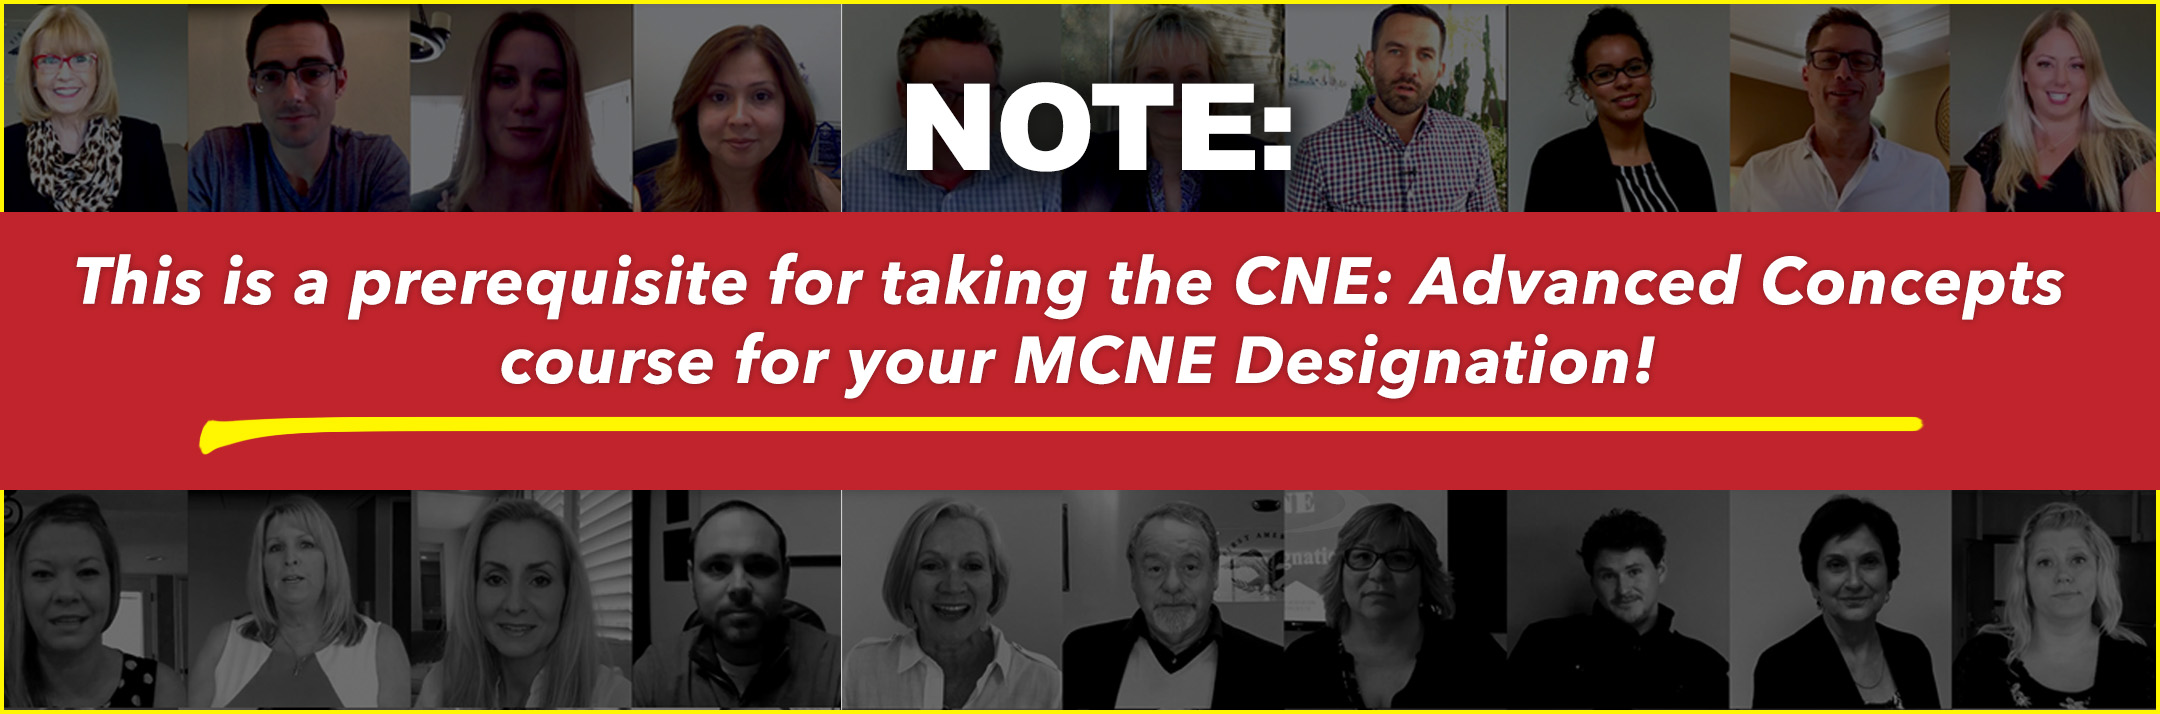 CNE Core Concepts (CNE Designation Course) - Sandy, UT (Bruce Dunning)